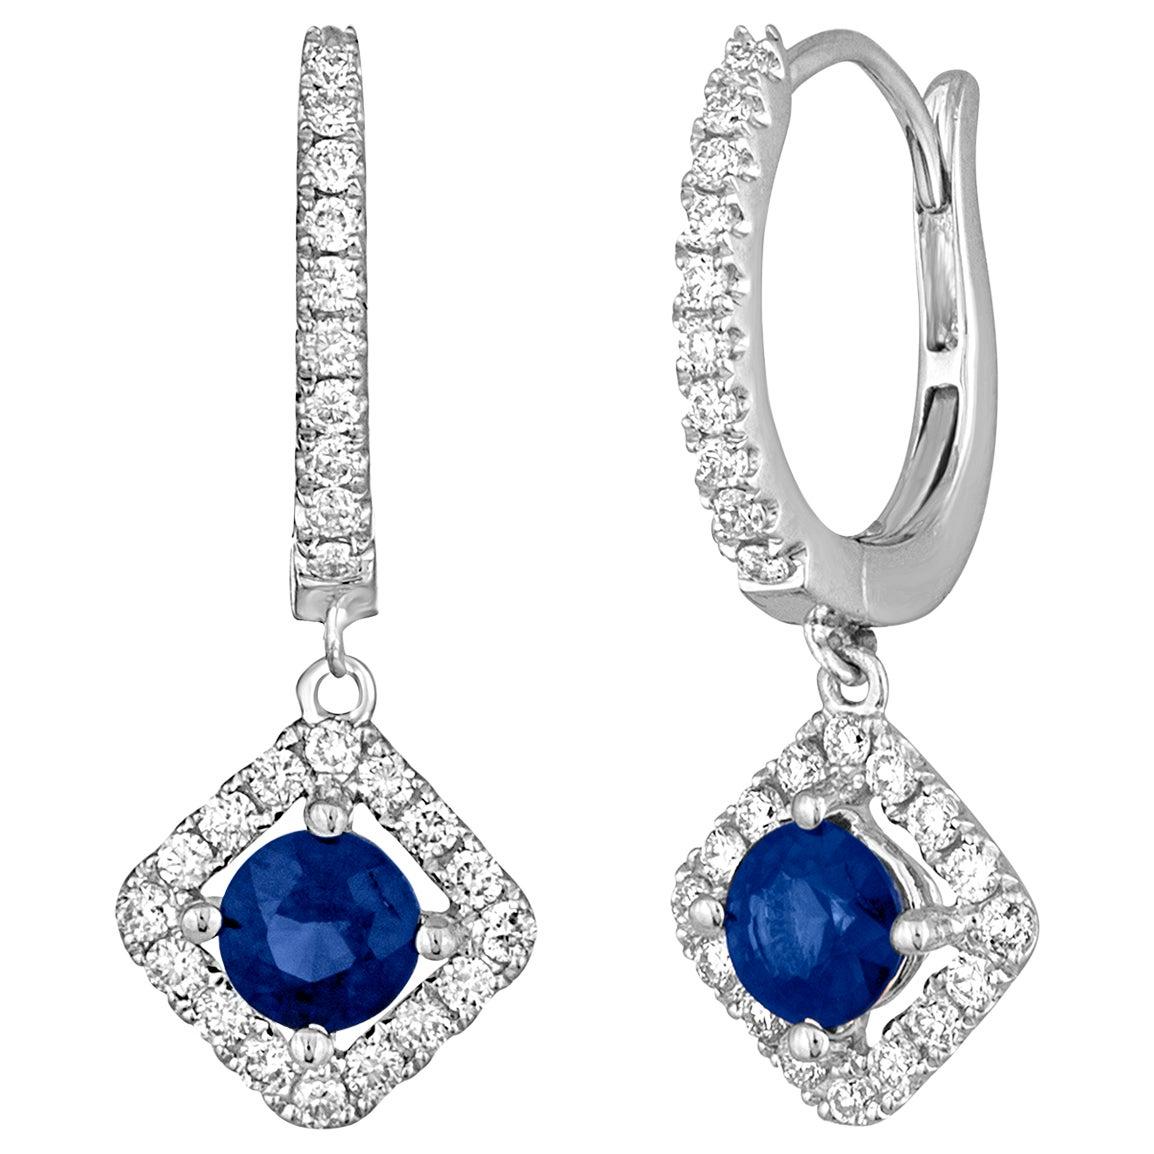 0.95 Carats Sapphire And Diamond Gold Dangle Earrings